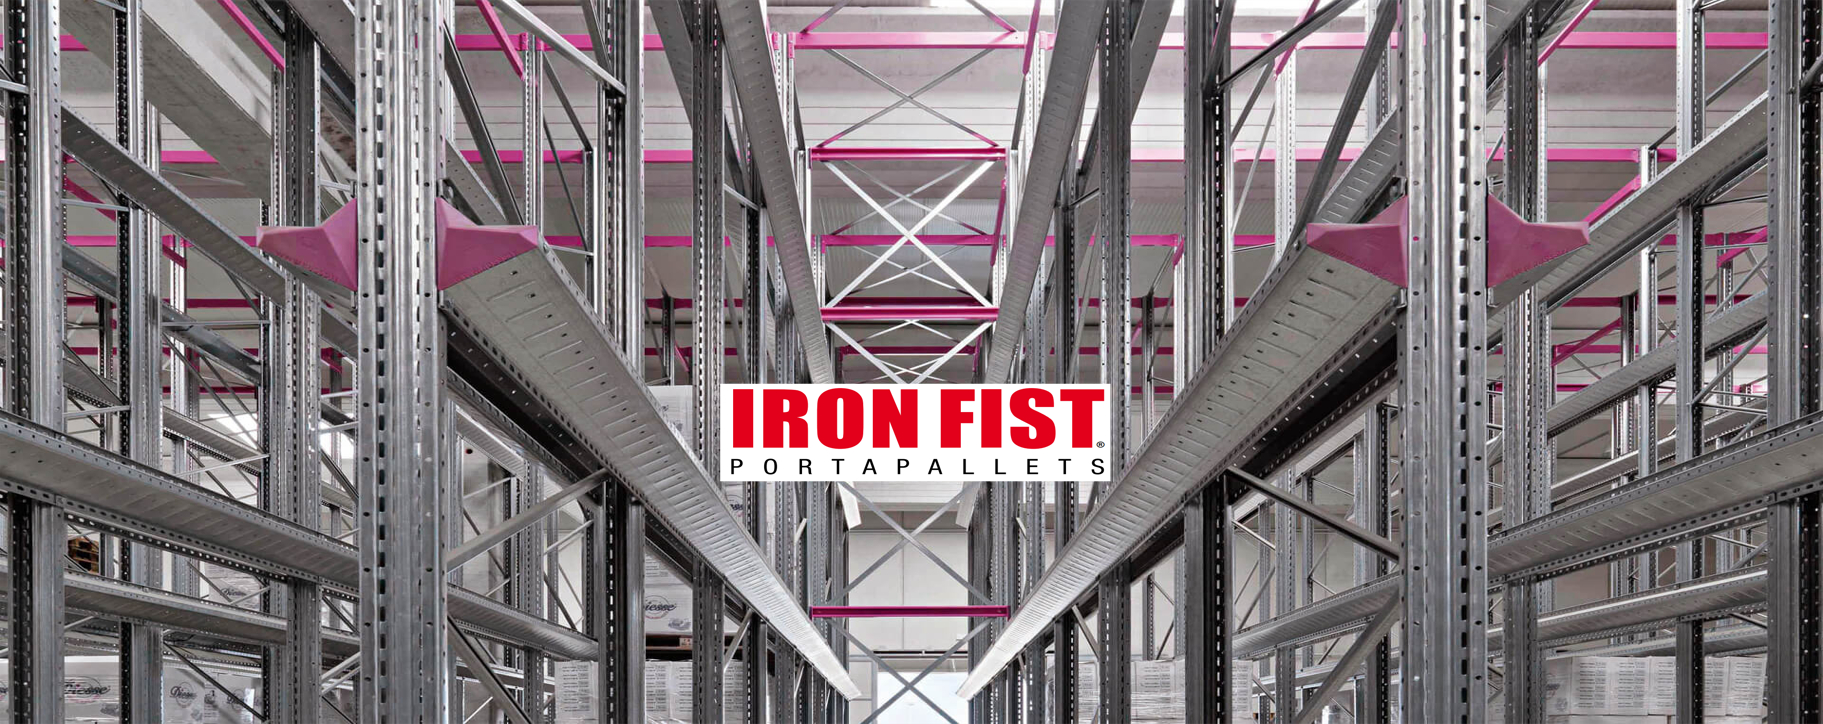 Rafturi Iron Fist depozitare paleti drive-in